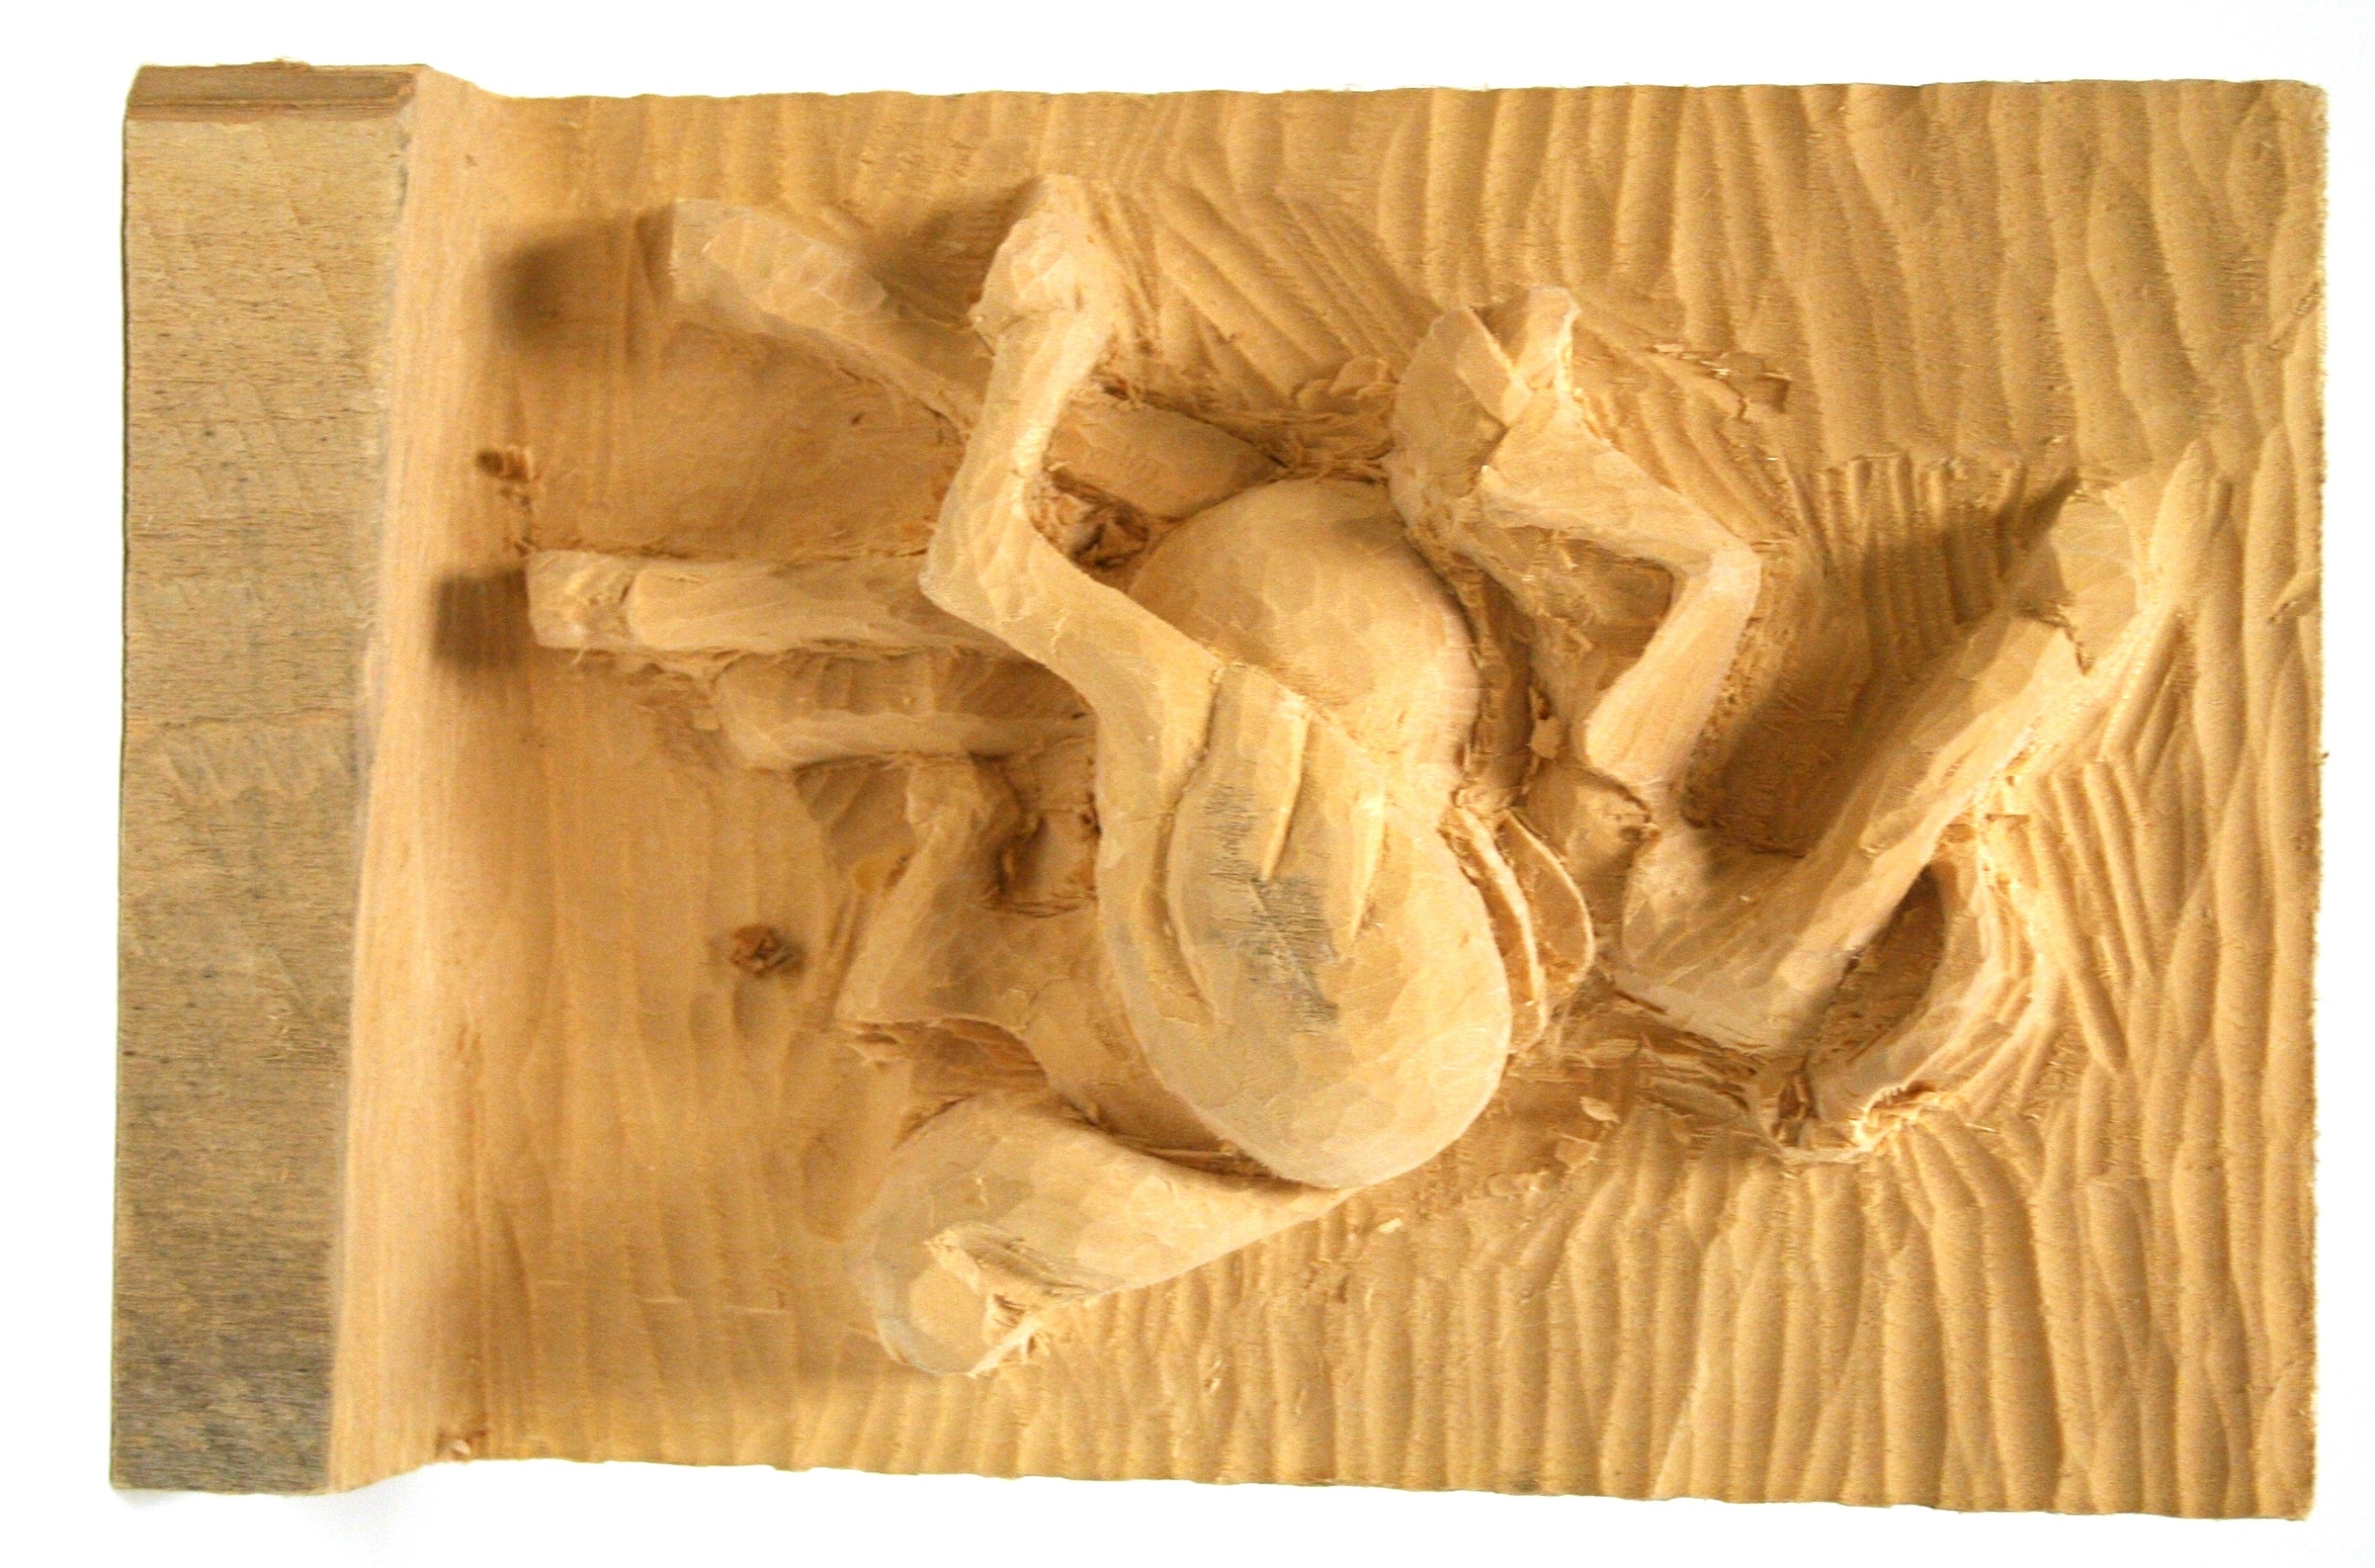 Jim savage s woodcarving tools